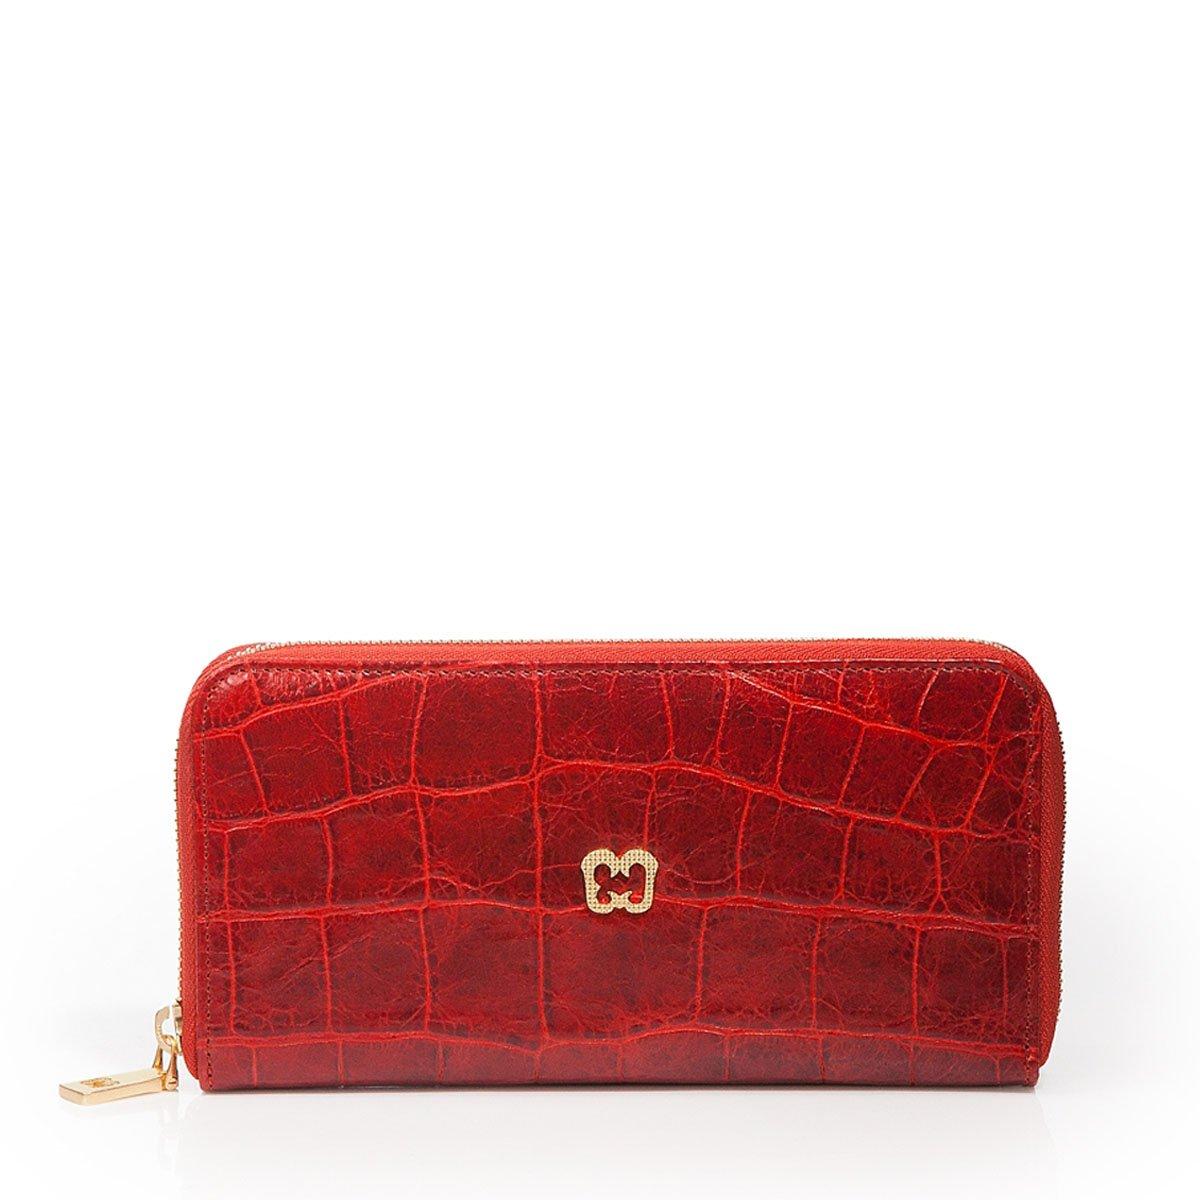 Eric Javits Luxury Fashion Designer Women's Handbag  Zip Wallet  Red